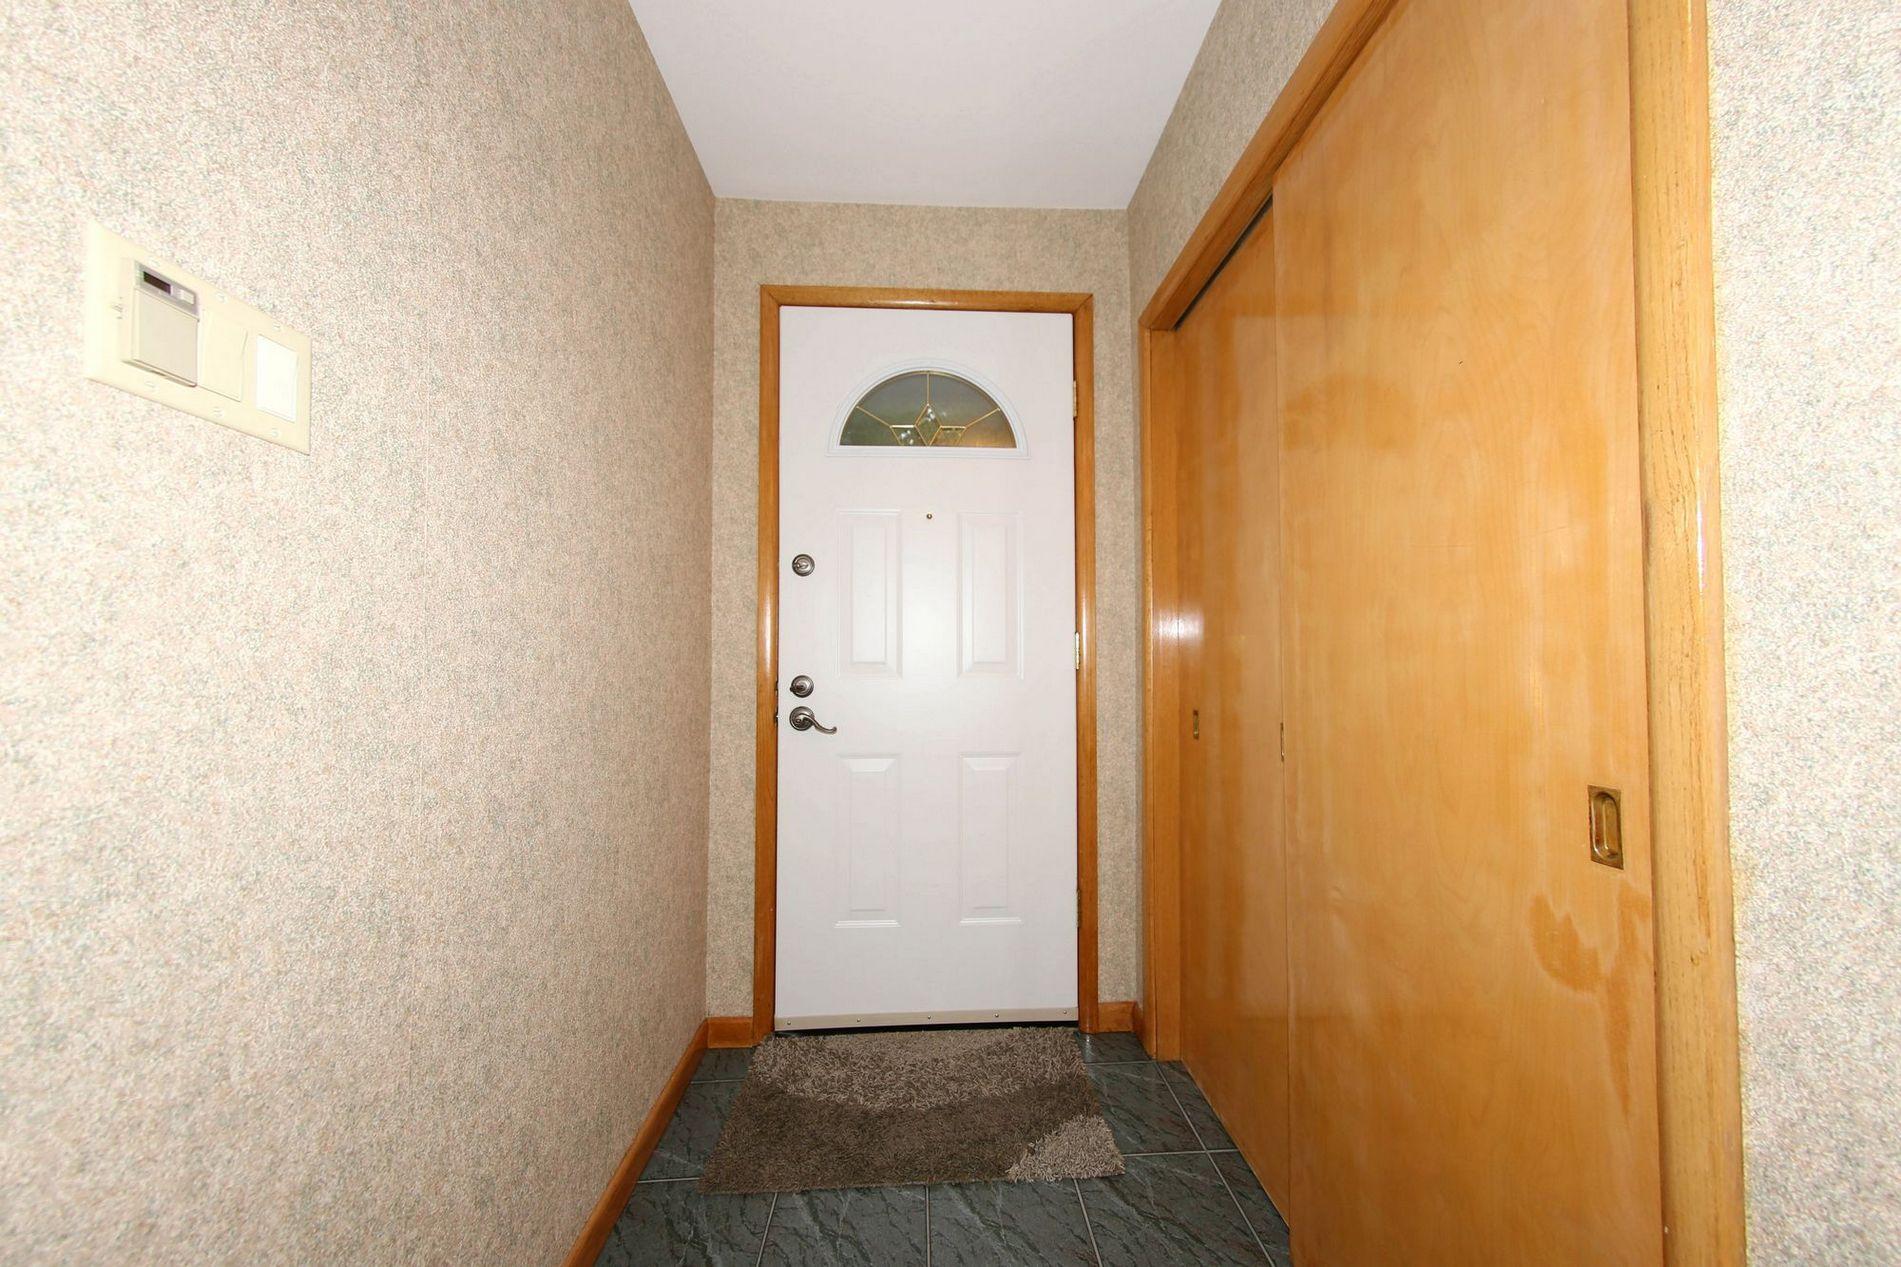 804 Borebank Street, Winnipeg, Manitoba  R3N 1G4 - Photo 1 - 1716415